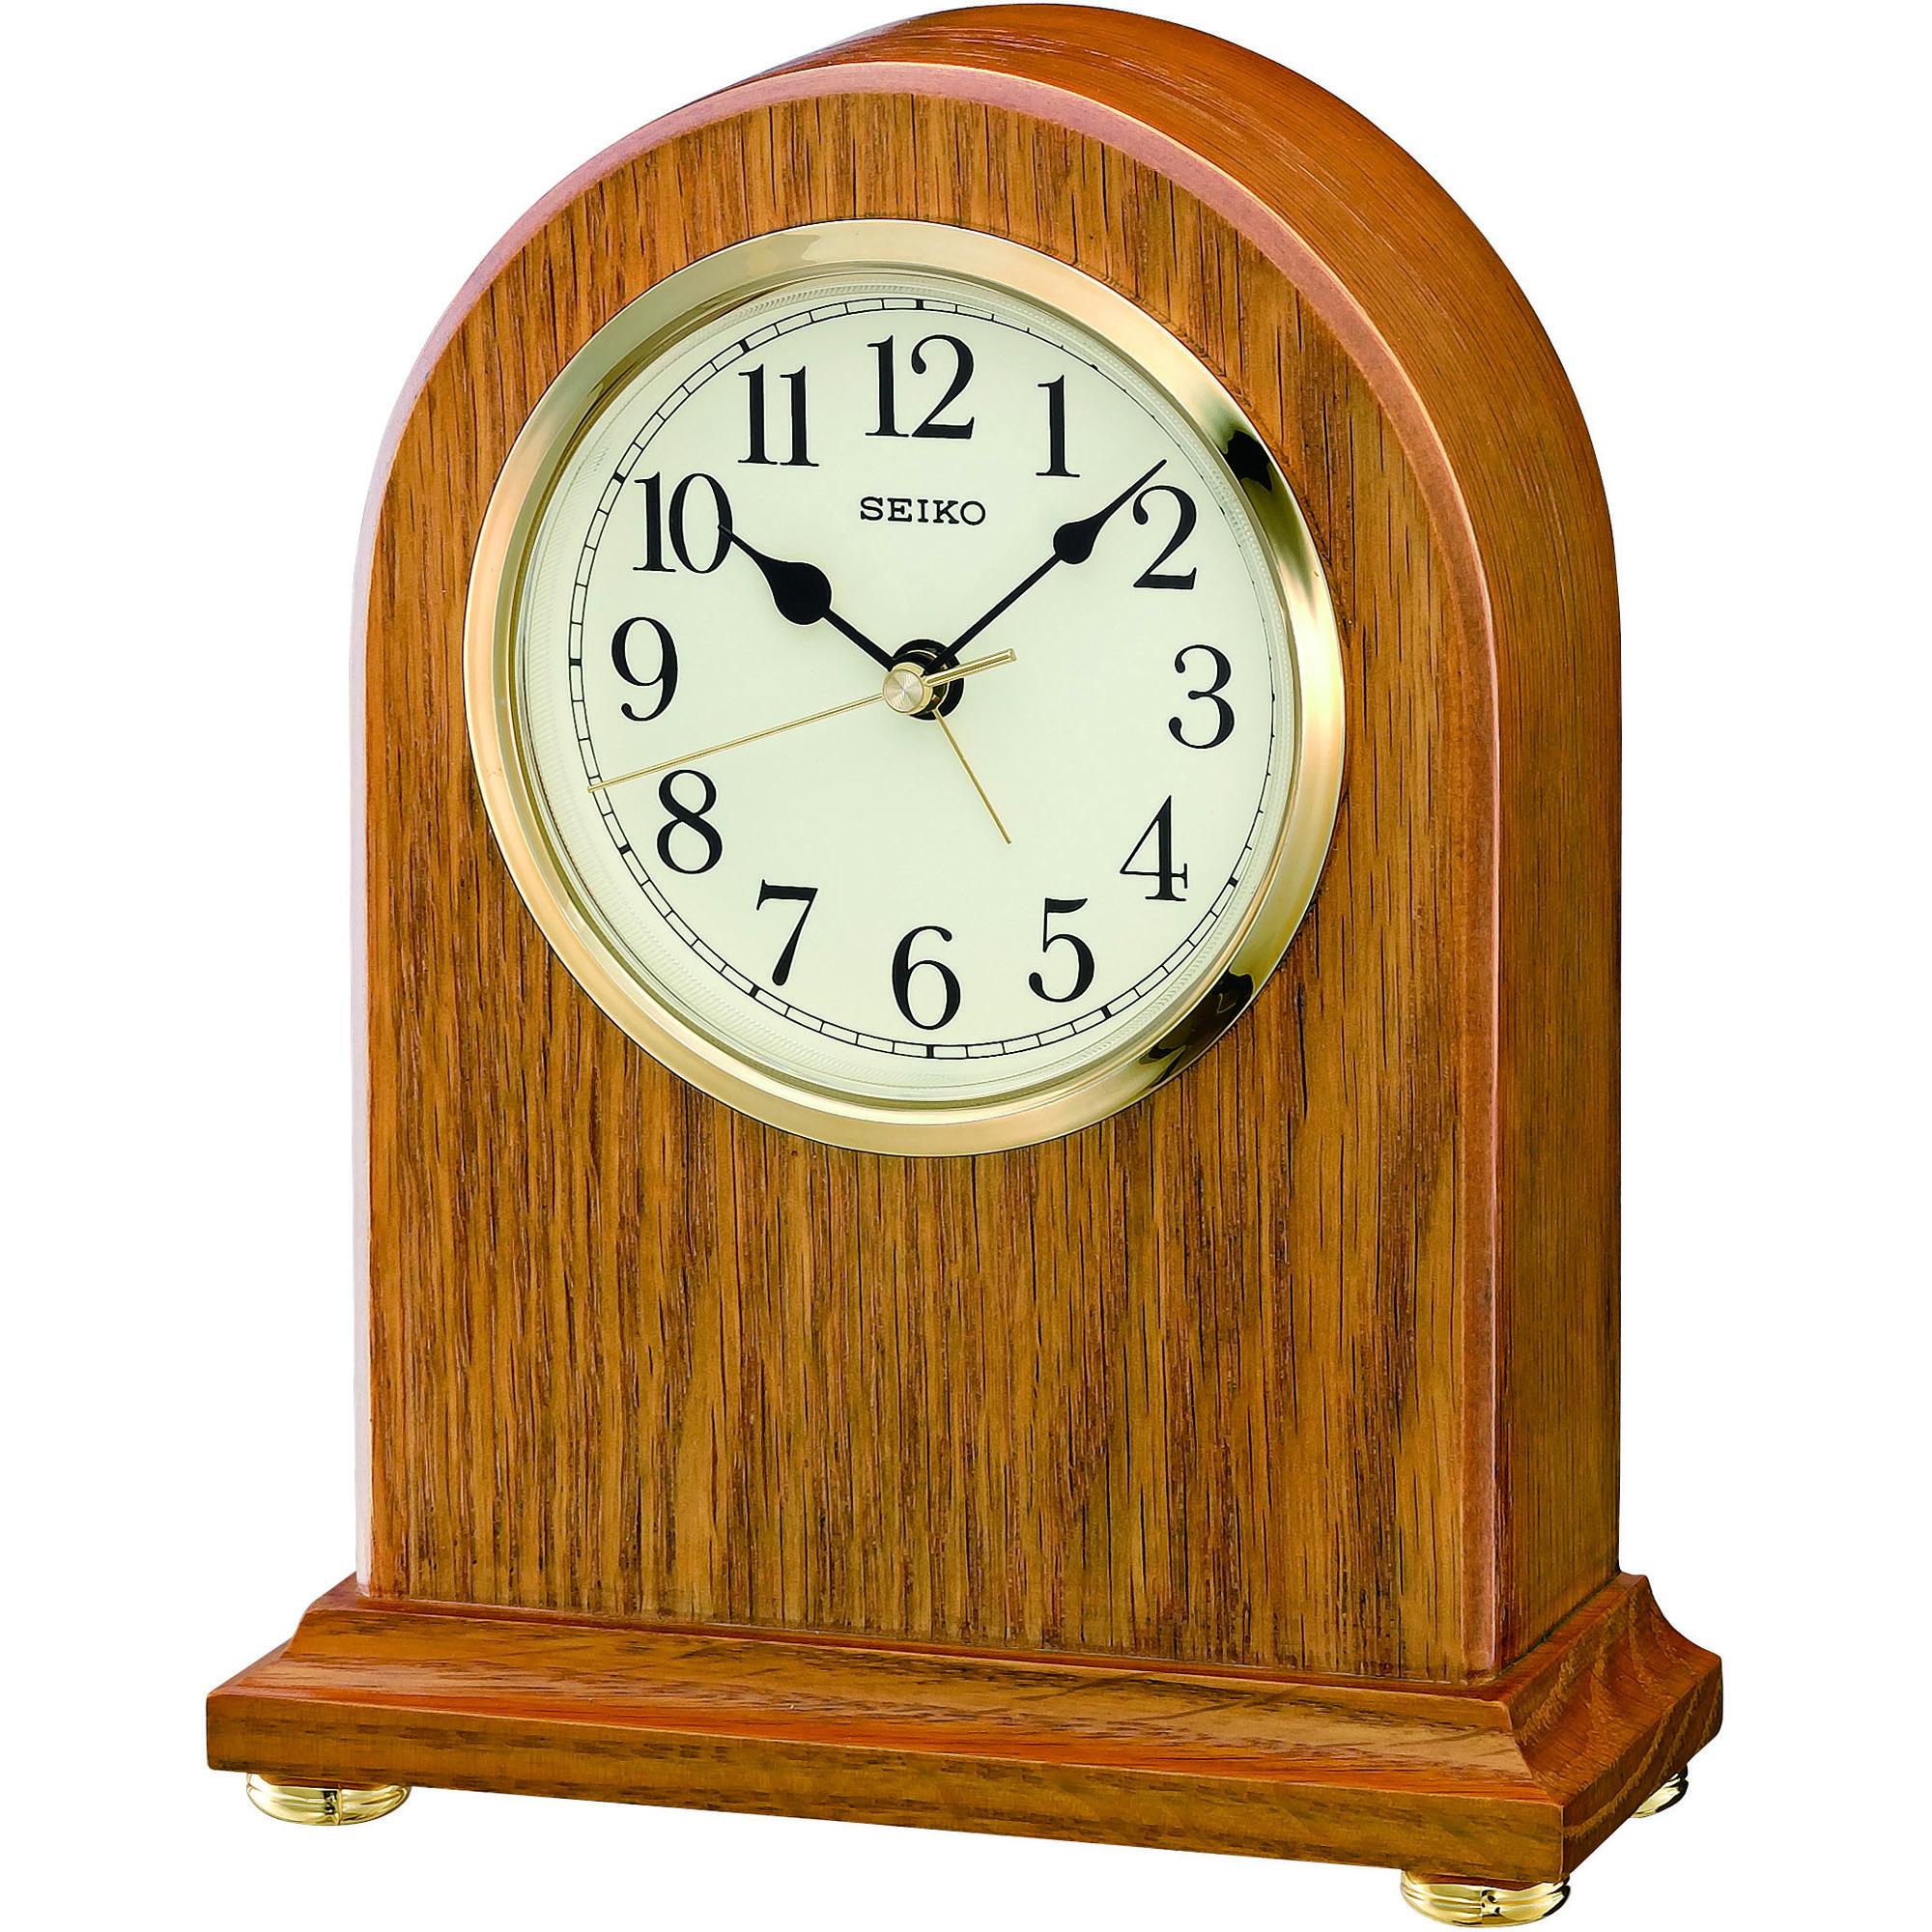 clock seiko clocks wooden mantel clock alarm watch qxe031b rh watchshop com Art Deco Mantel Clocks Pendulum Clock